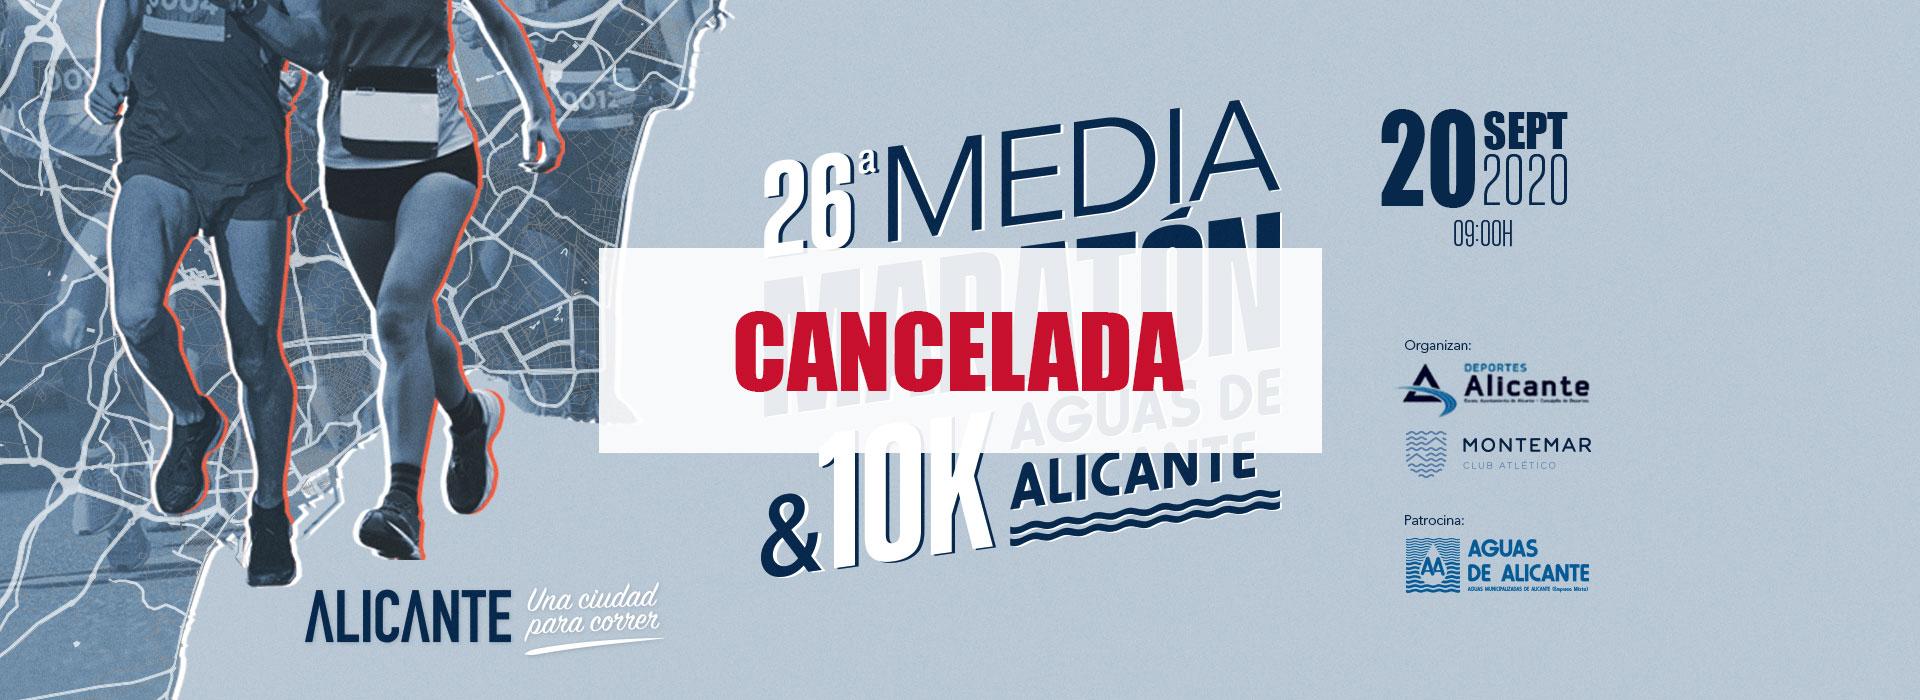 Cancelada